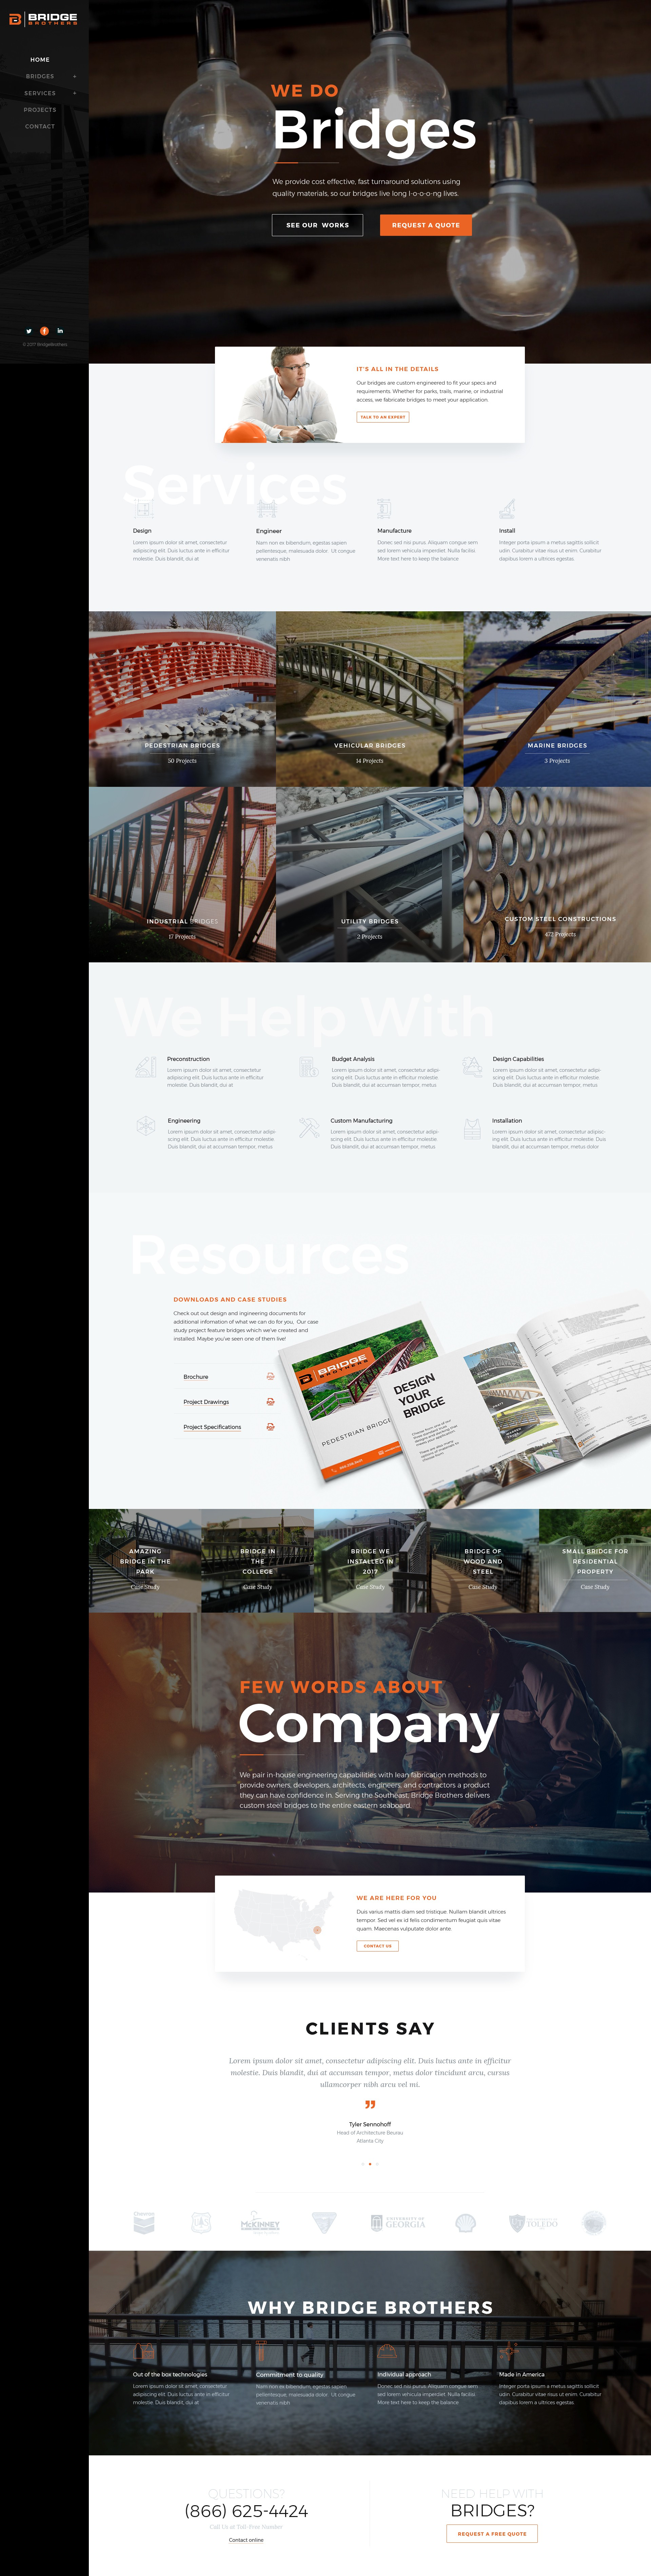 Bridge Brothers - Homepage Design